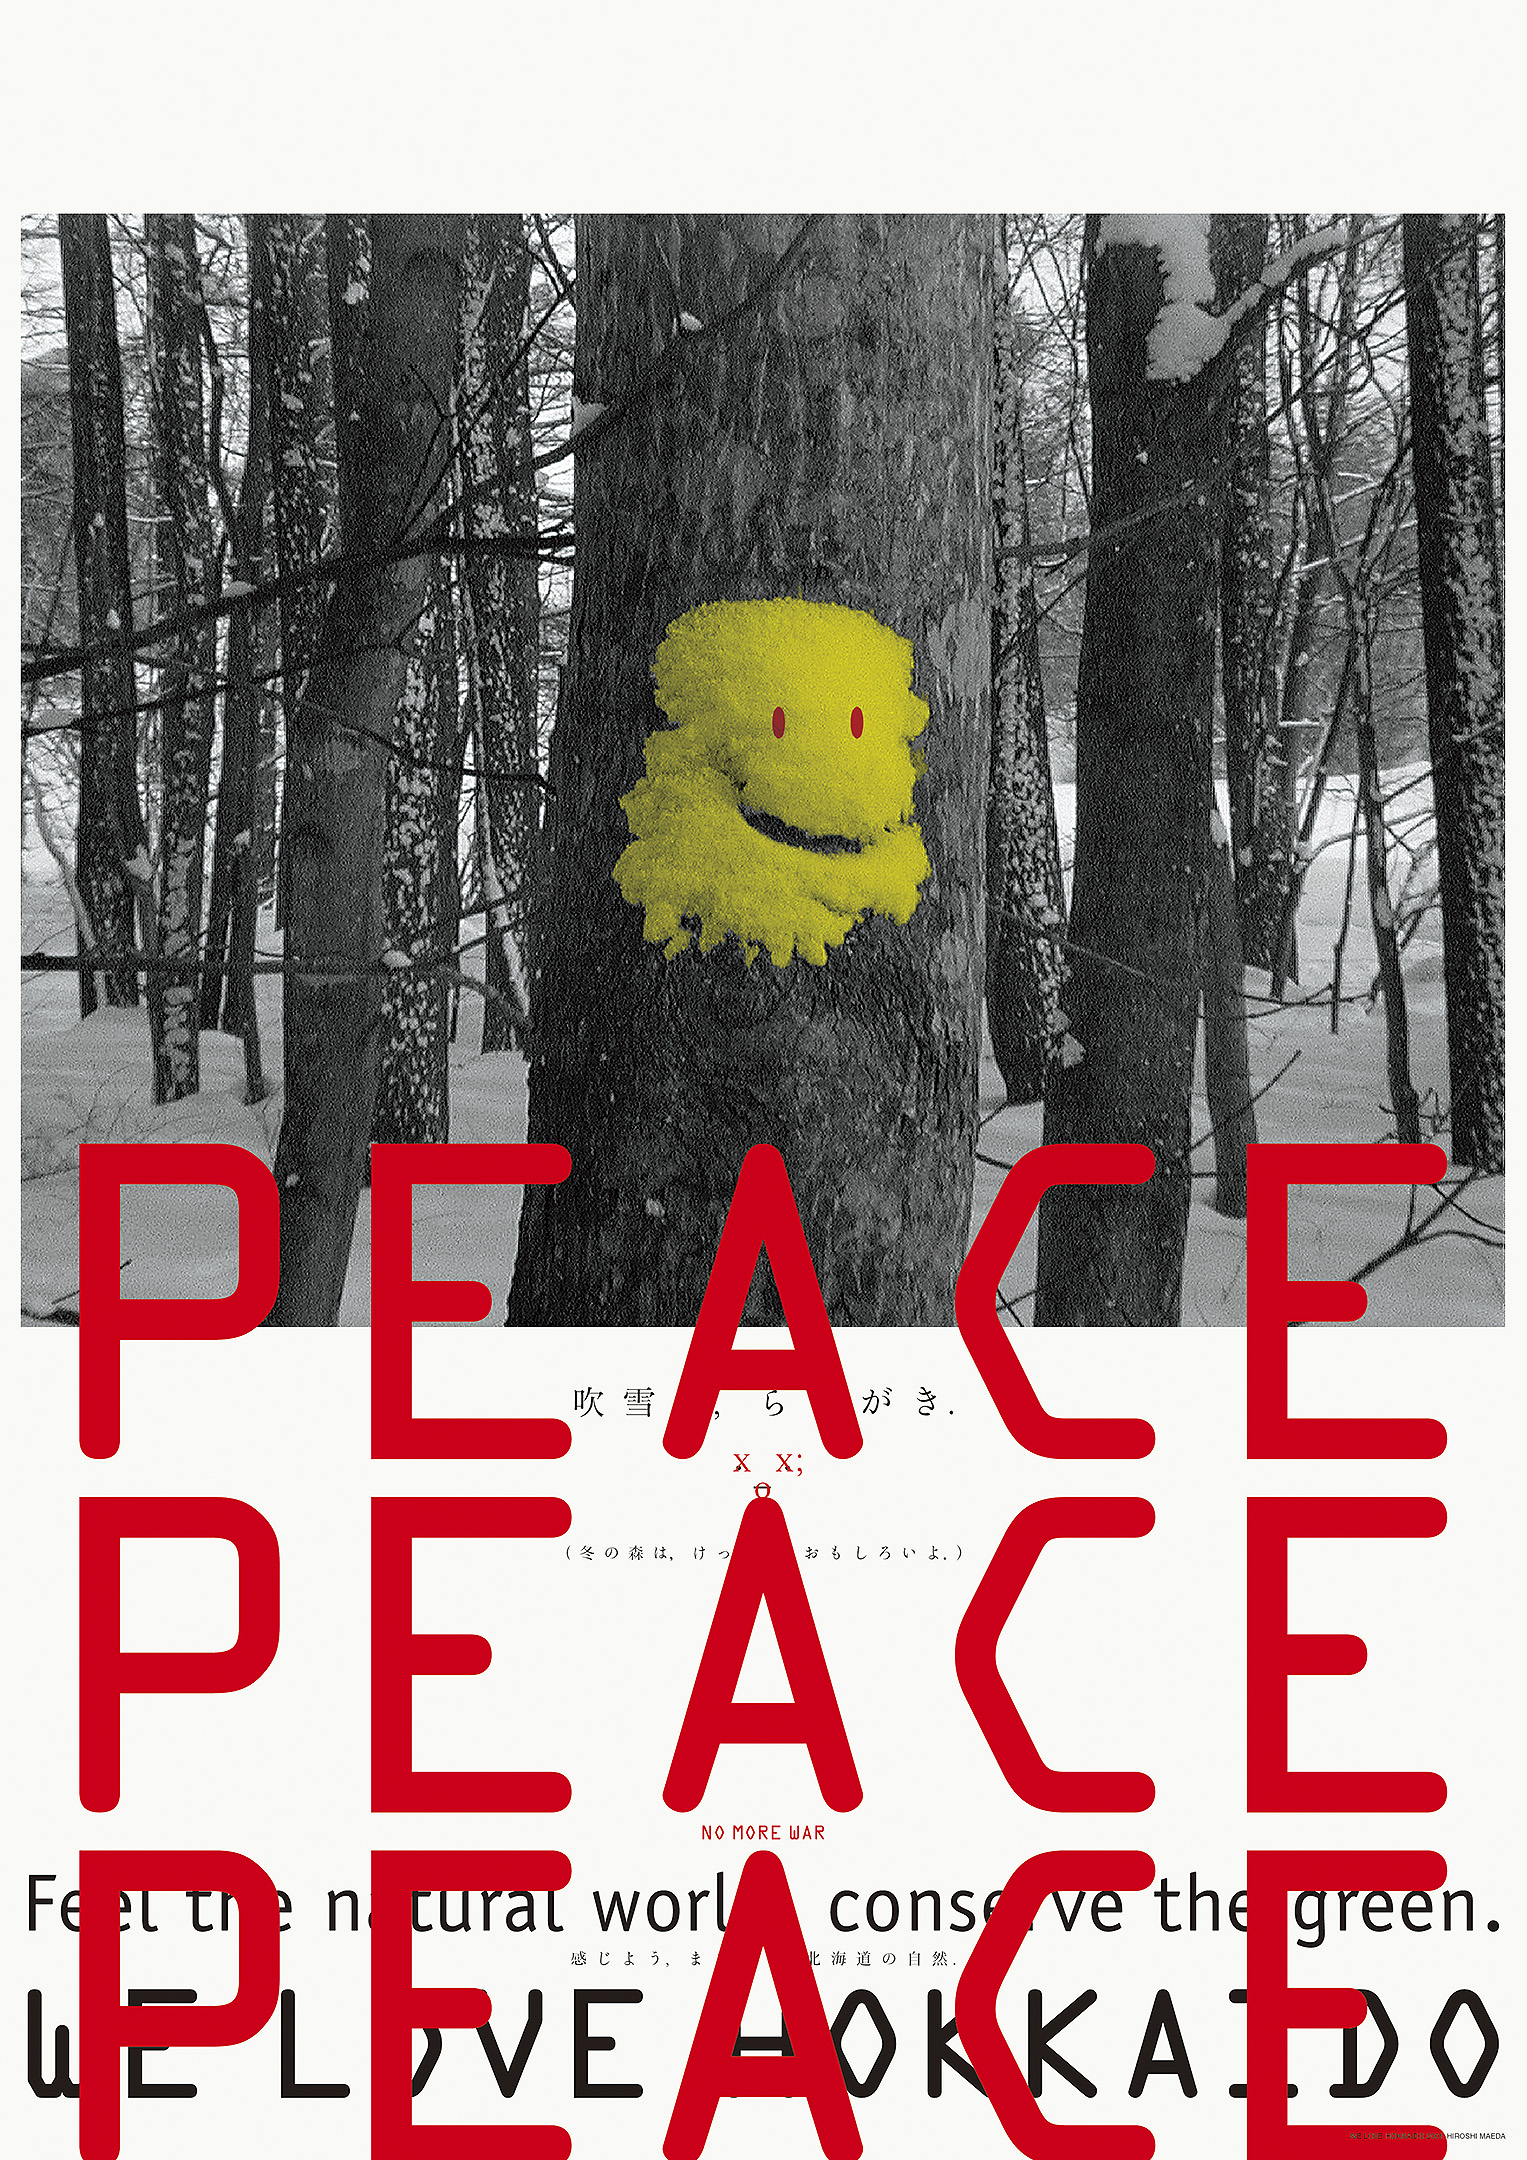 Peace Peace Peace, We Love Hokkaido